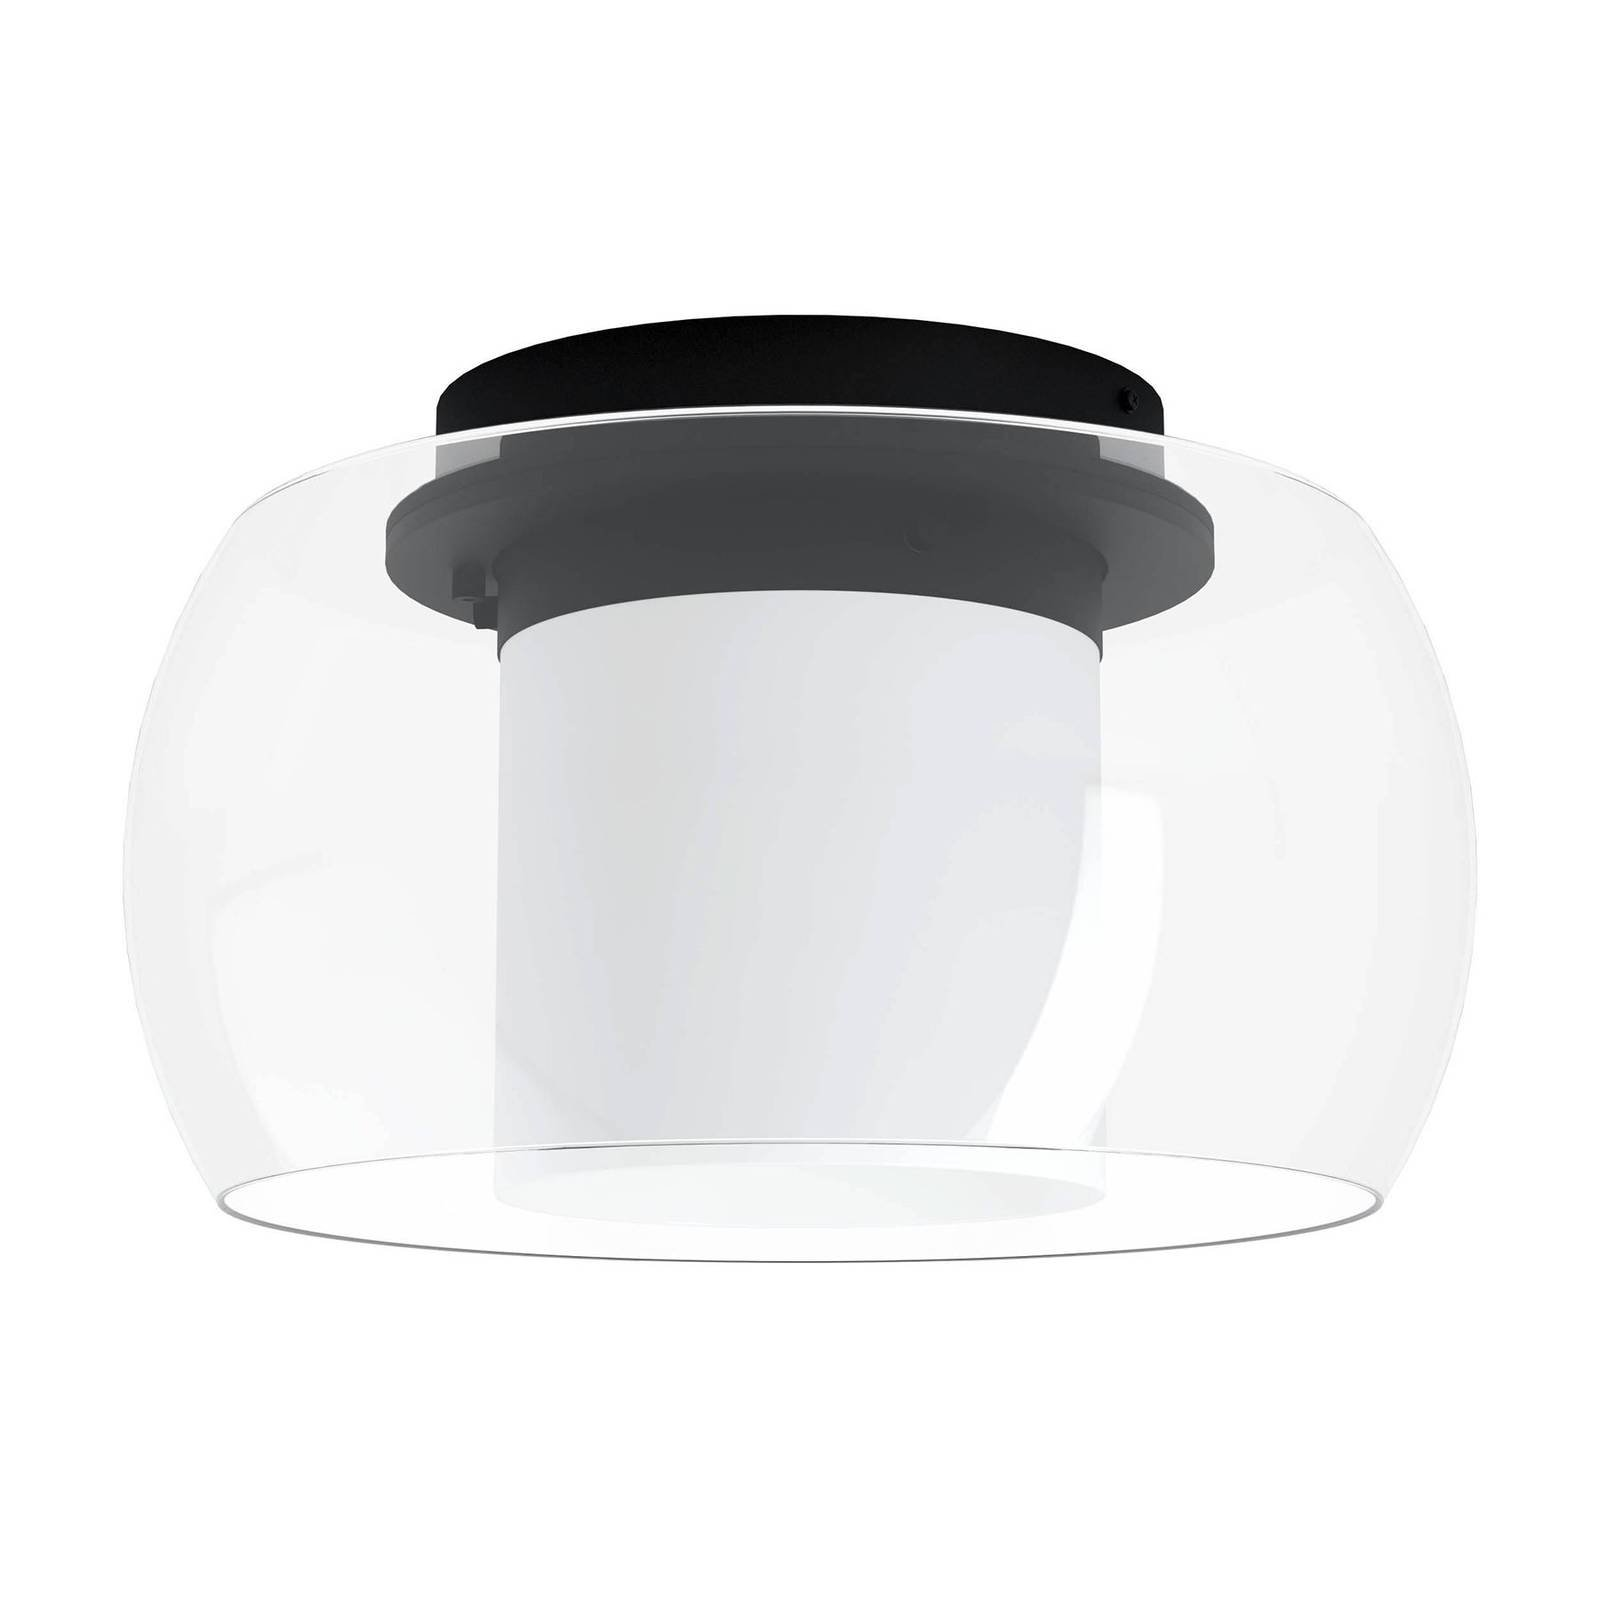 EGLO connect Criaglia-C LED-taklampe